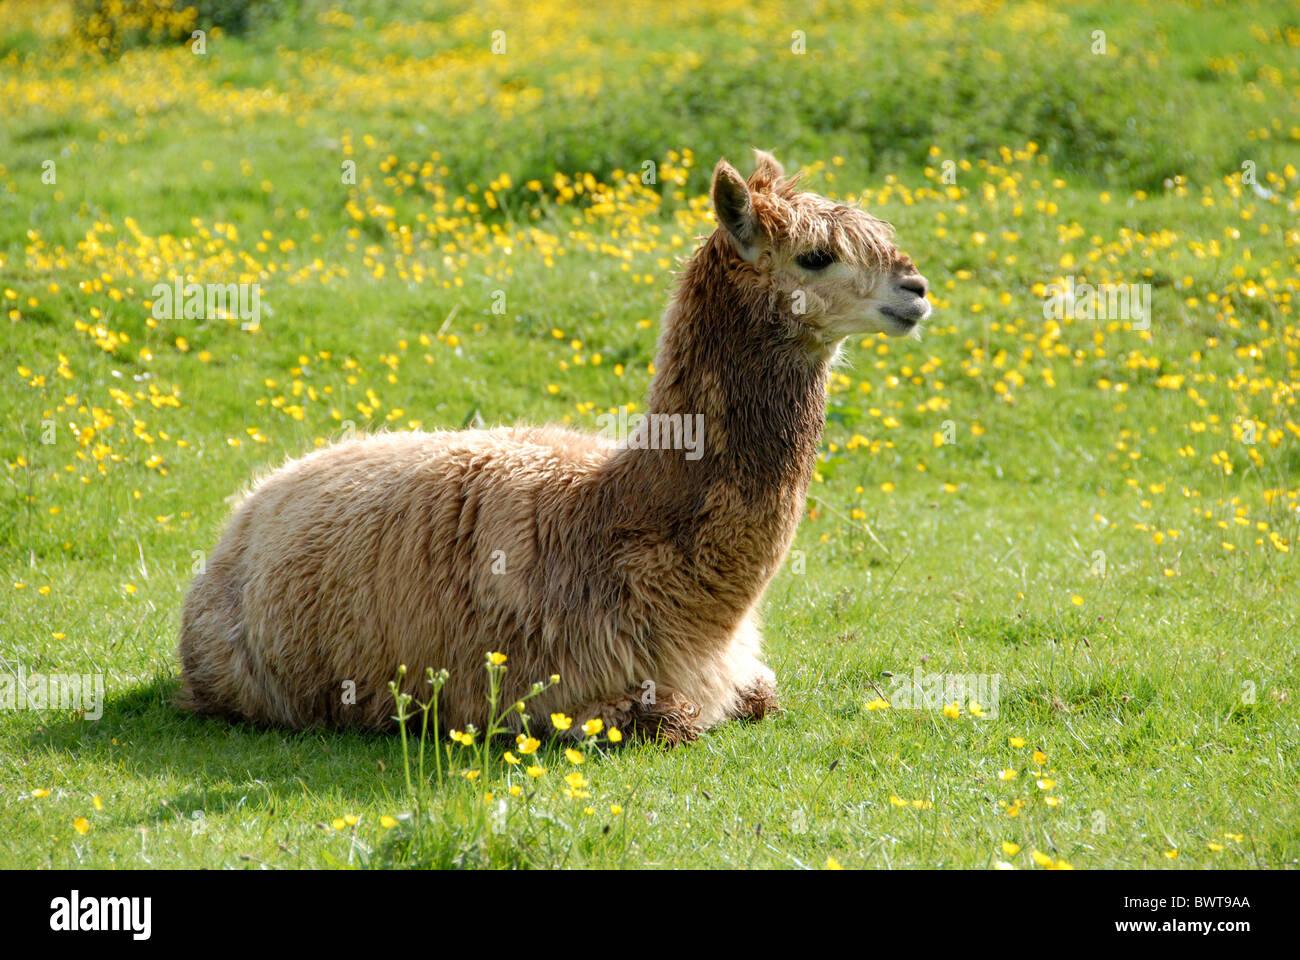 Aplaca lama pacos domestic pet meadow grass buttercups wool herbivore alpaca alpacas camelidae domestic domesticated - Stock Image